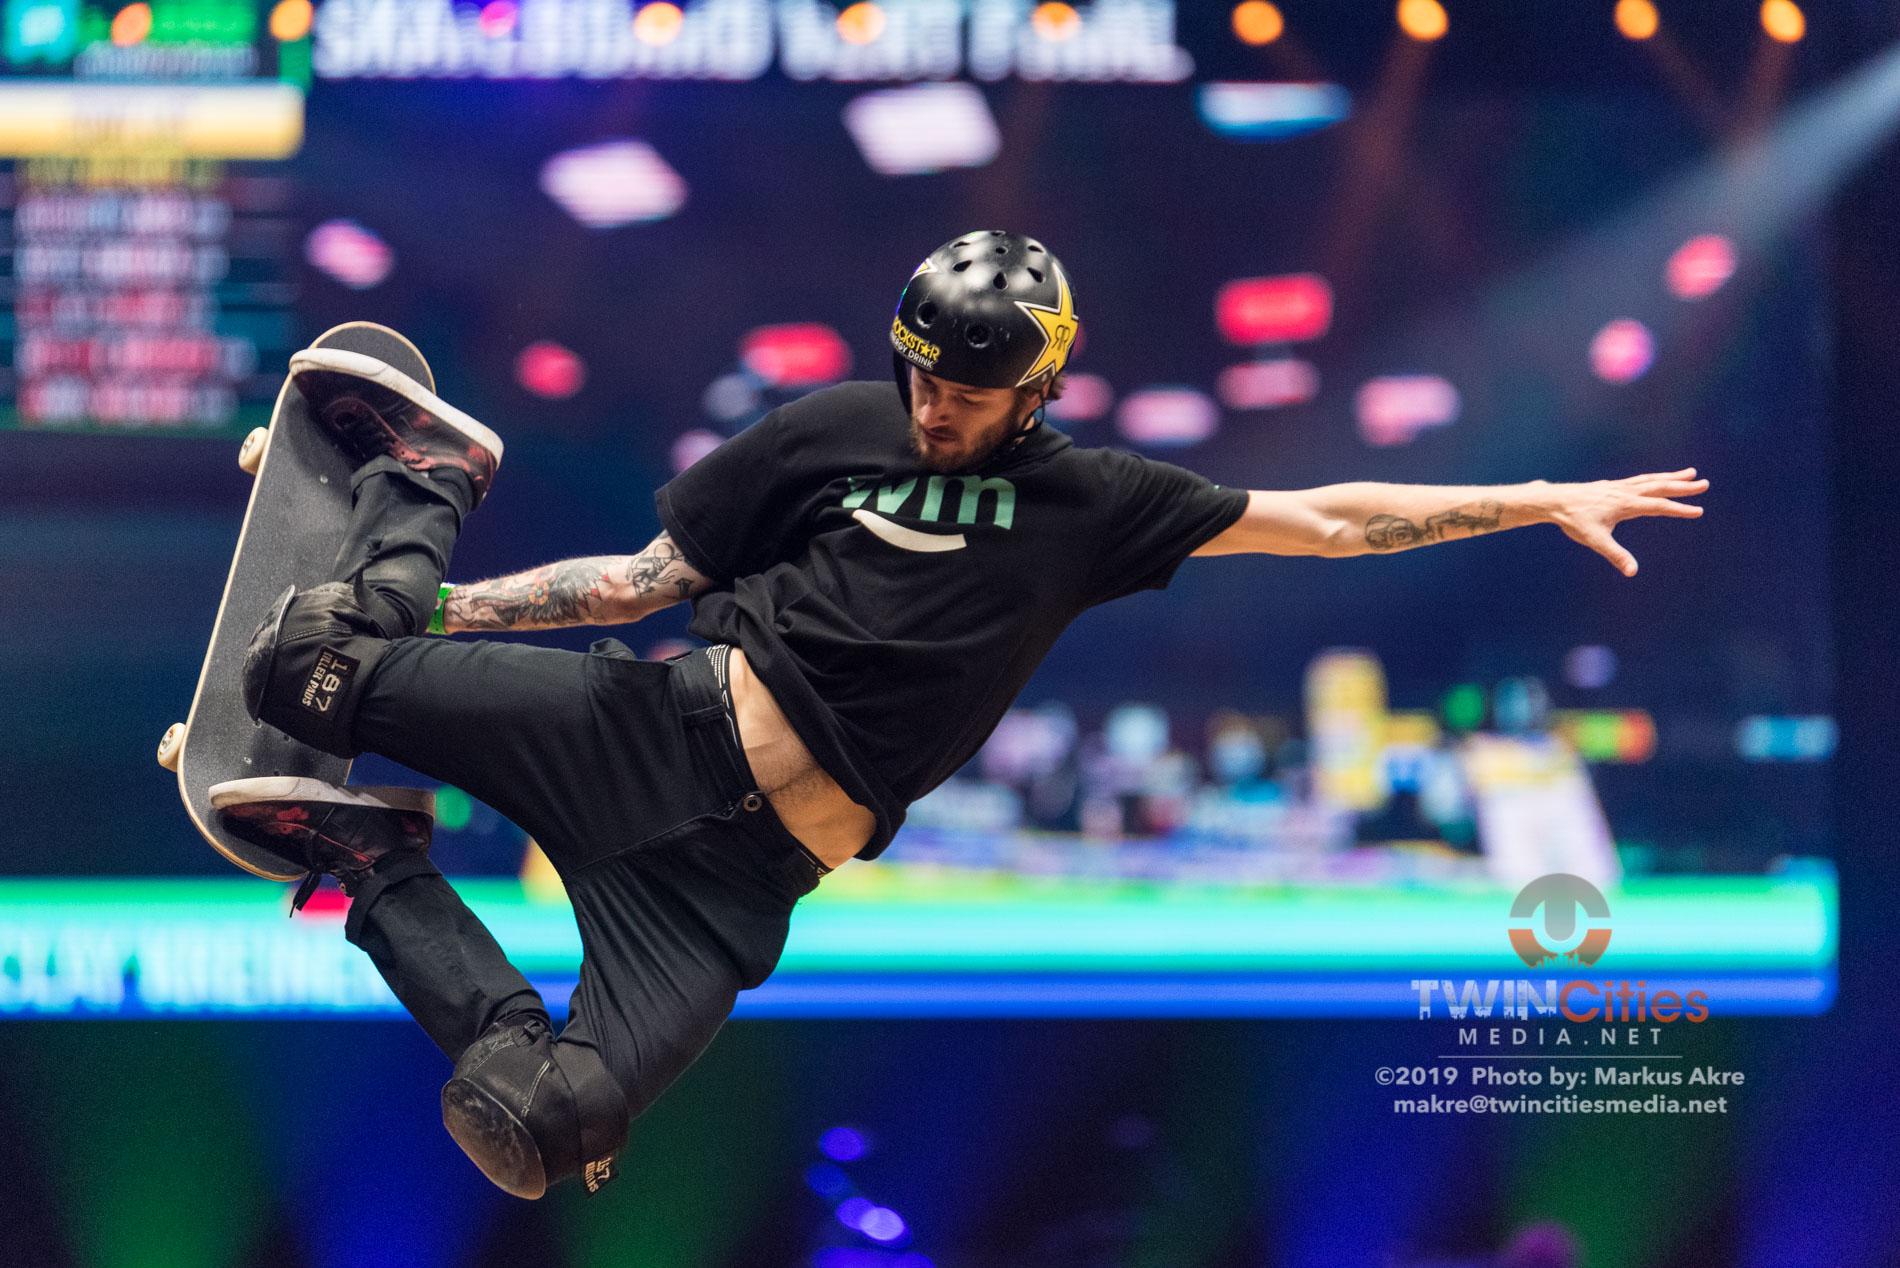 2019-X-Games-Day-1-Skateboard-Vert-14